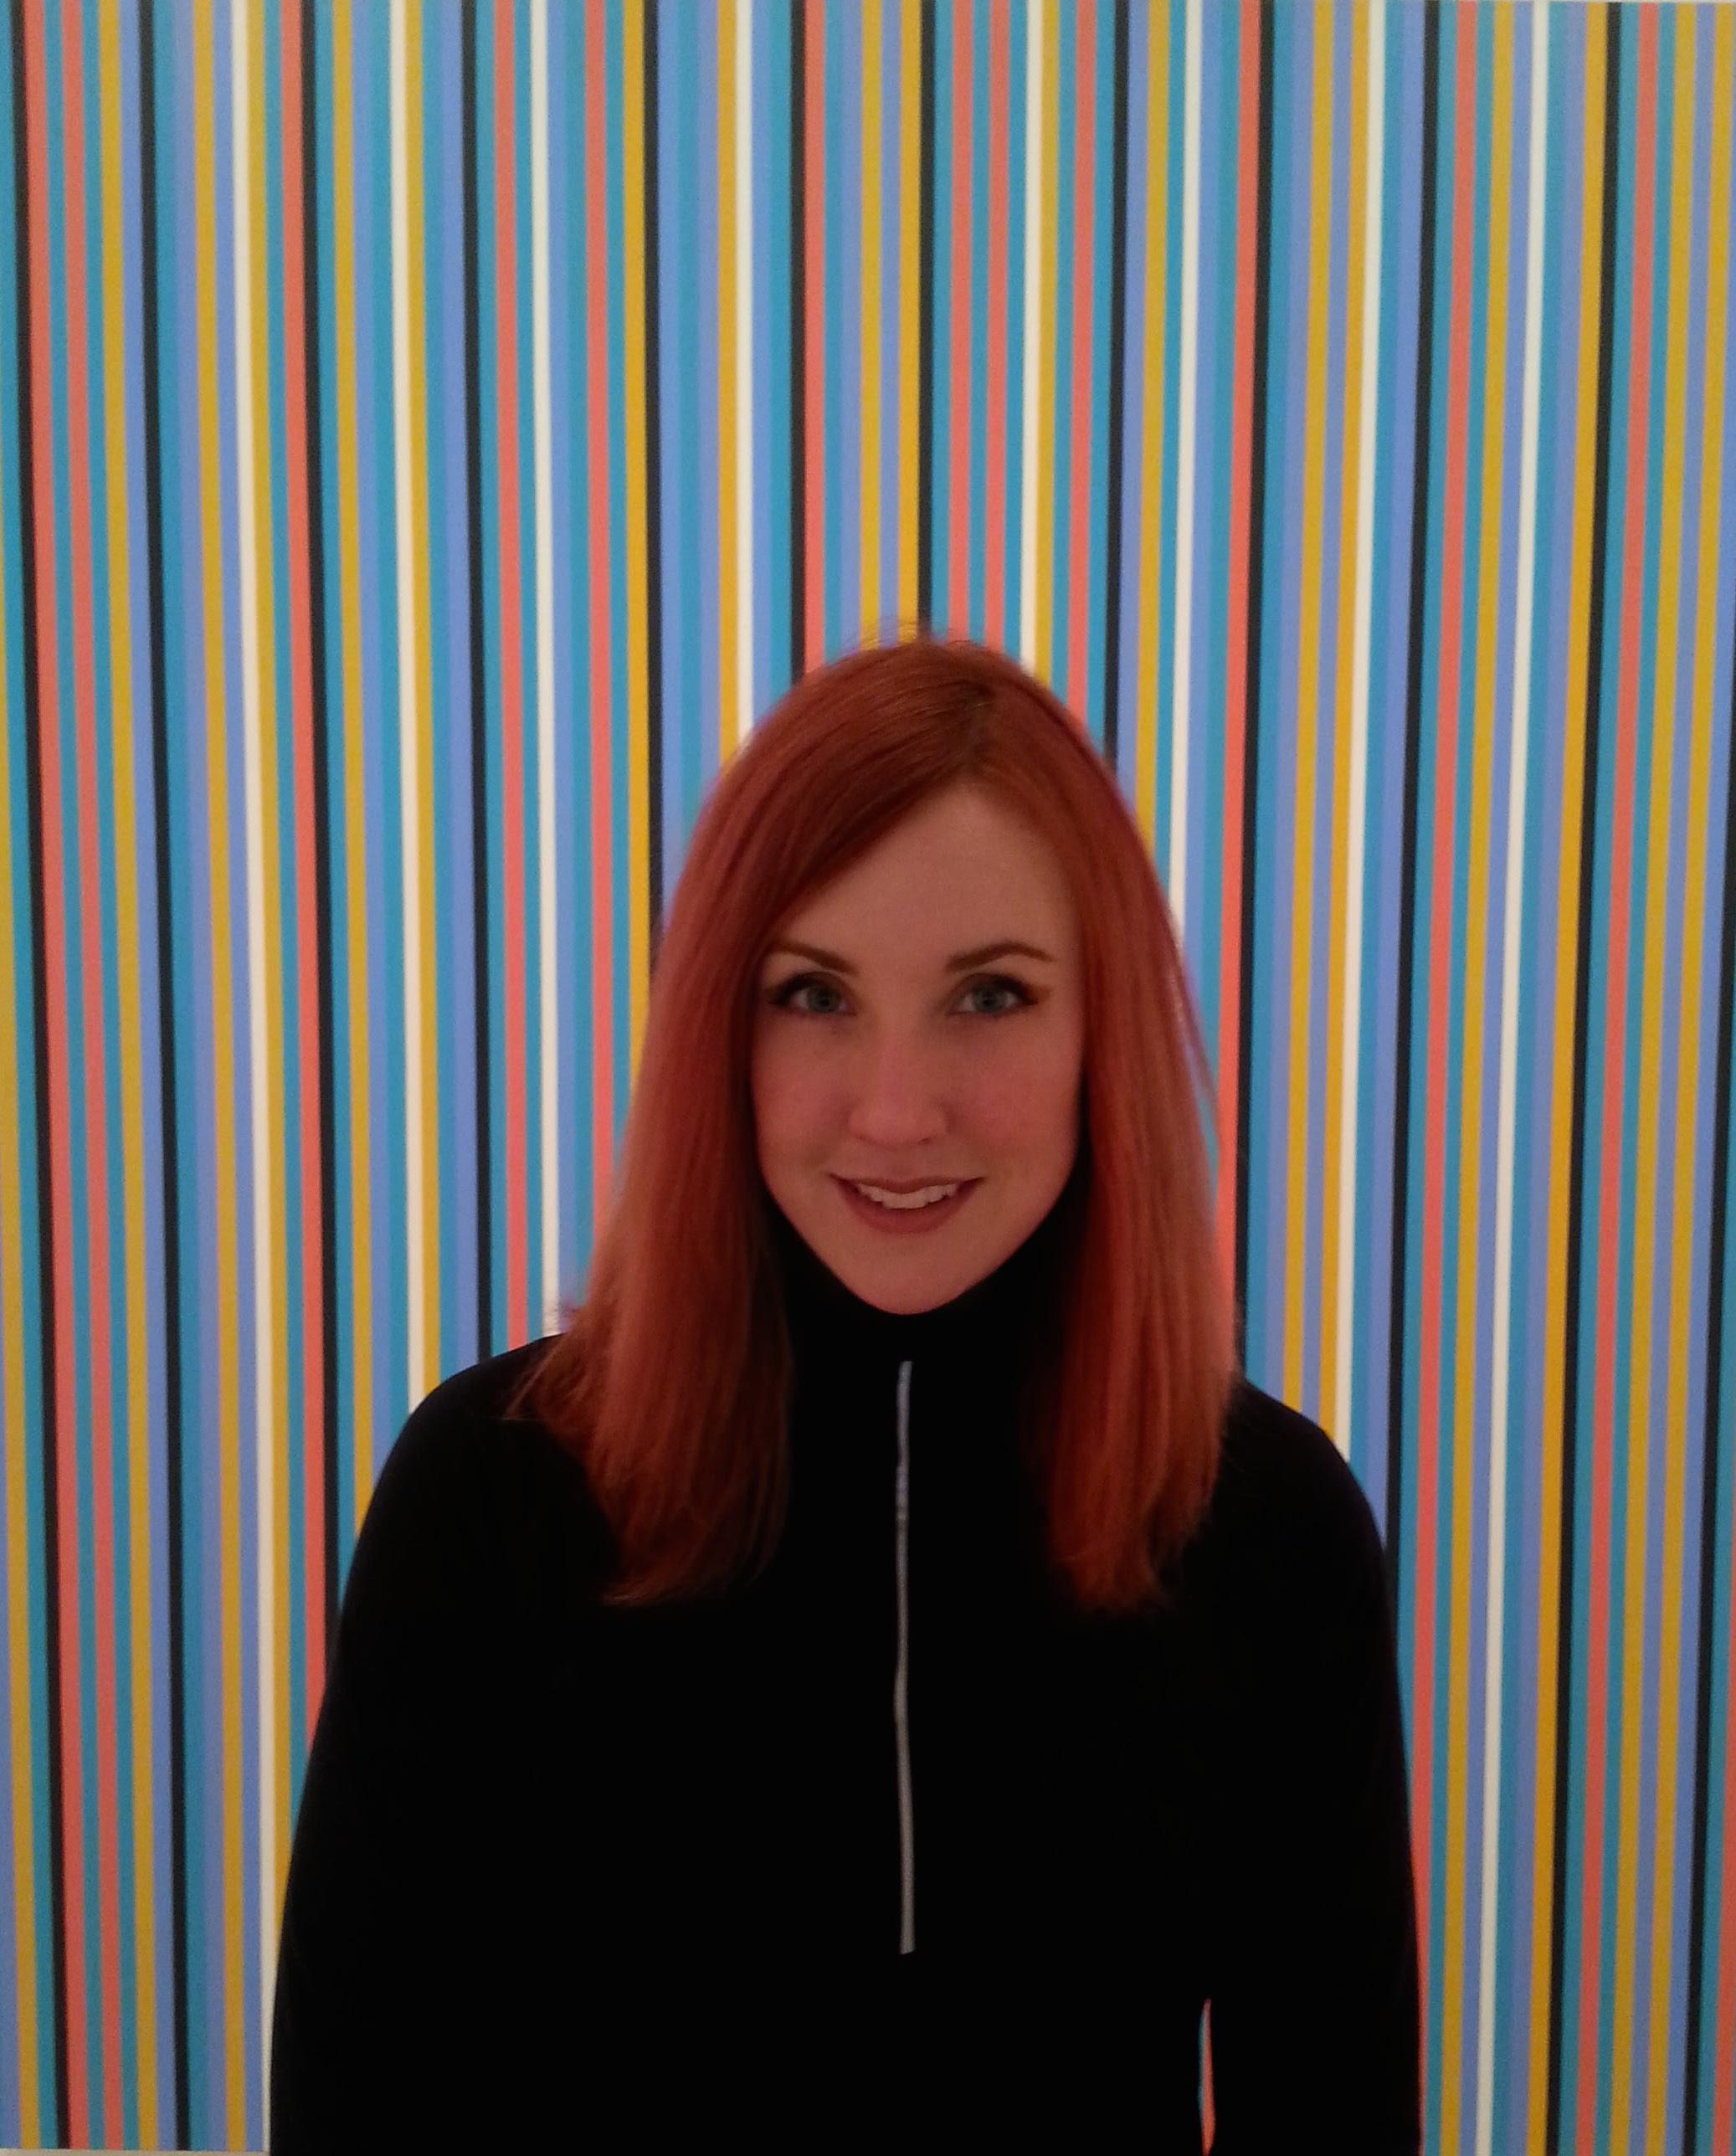 Photo of Erin Schubert